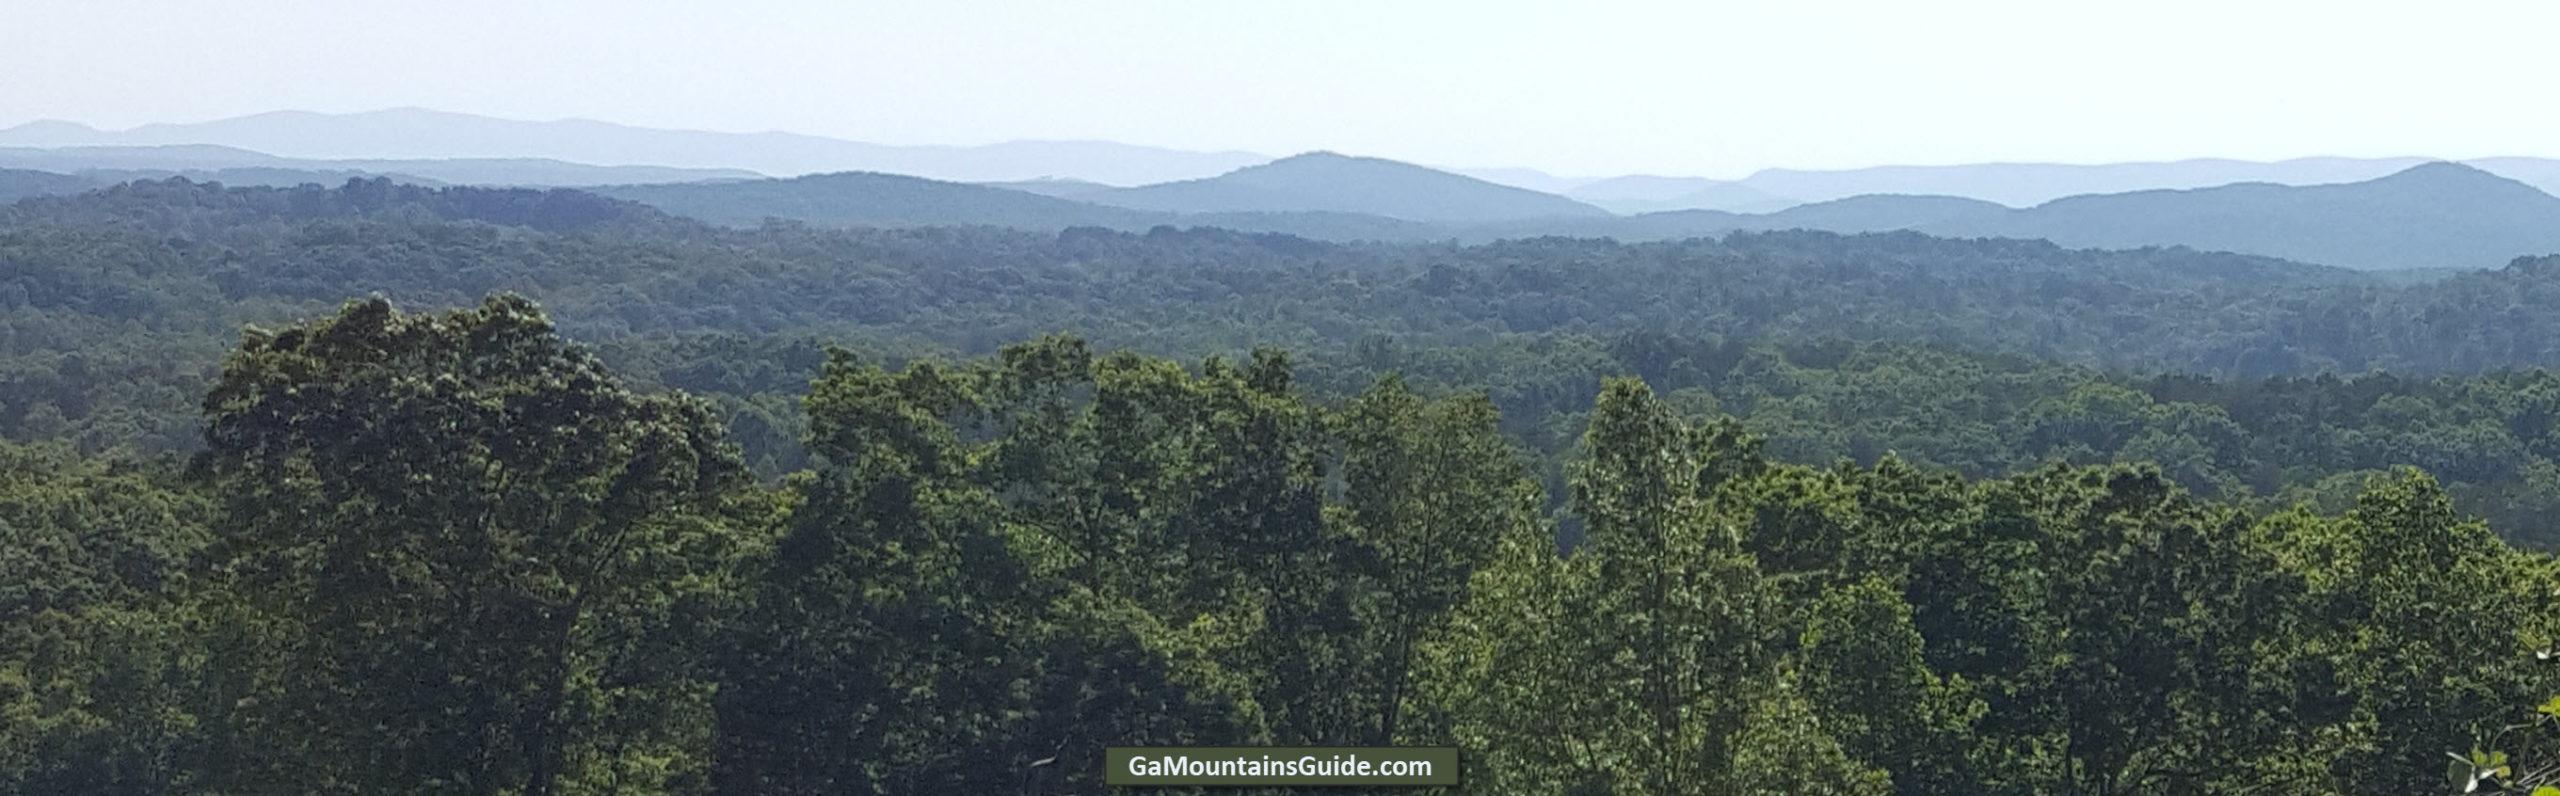 Wolf-Mountain-Vineyards-Blue-Ridge-Mountains-View-201605